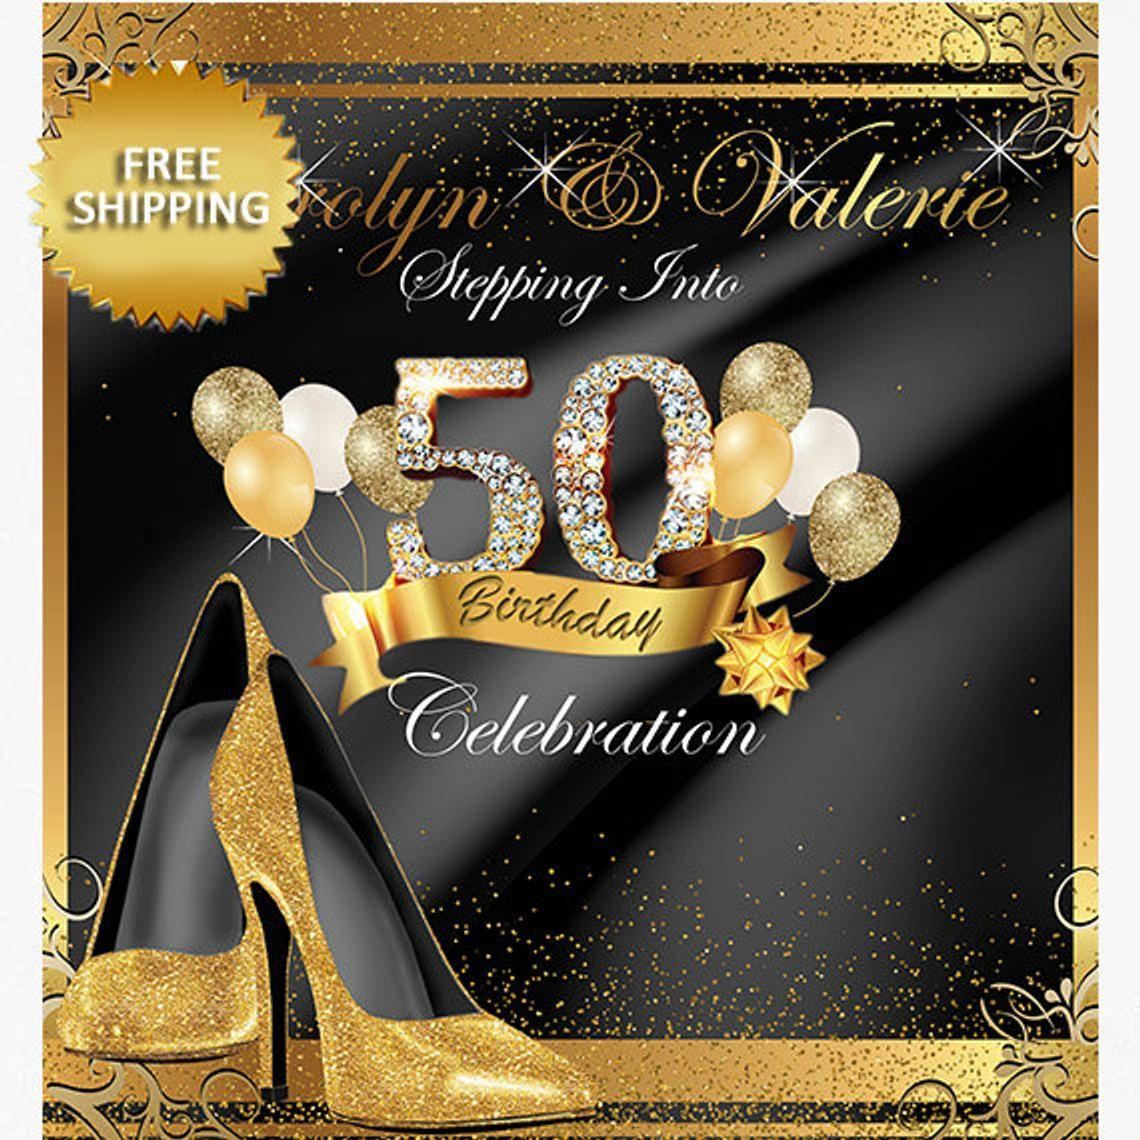 50 and Fabulous 50th Birthday Decoration 50th Birthday Banner 50 Birthday Fifty and Fabulous Party Happy Birthday 50th Birthday